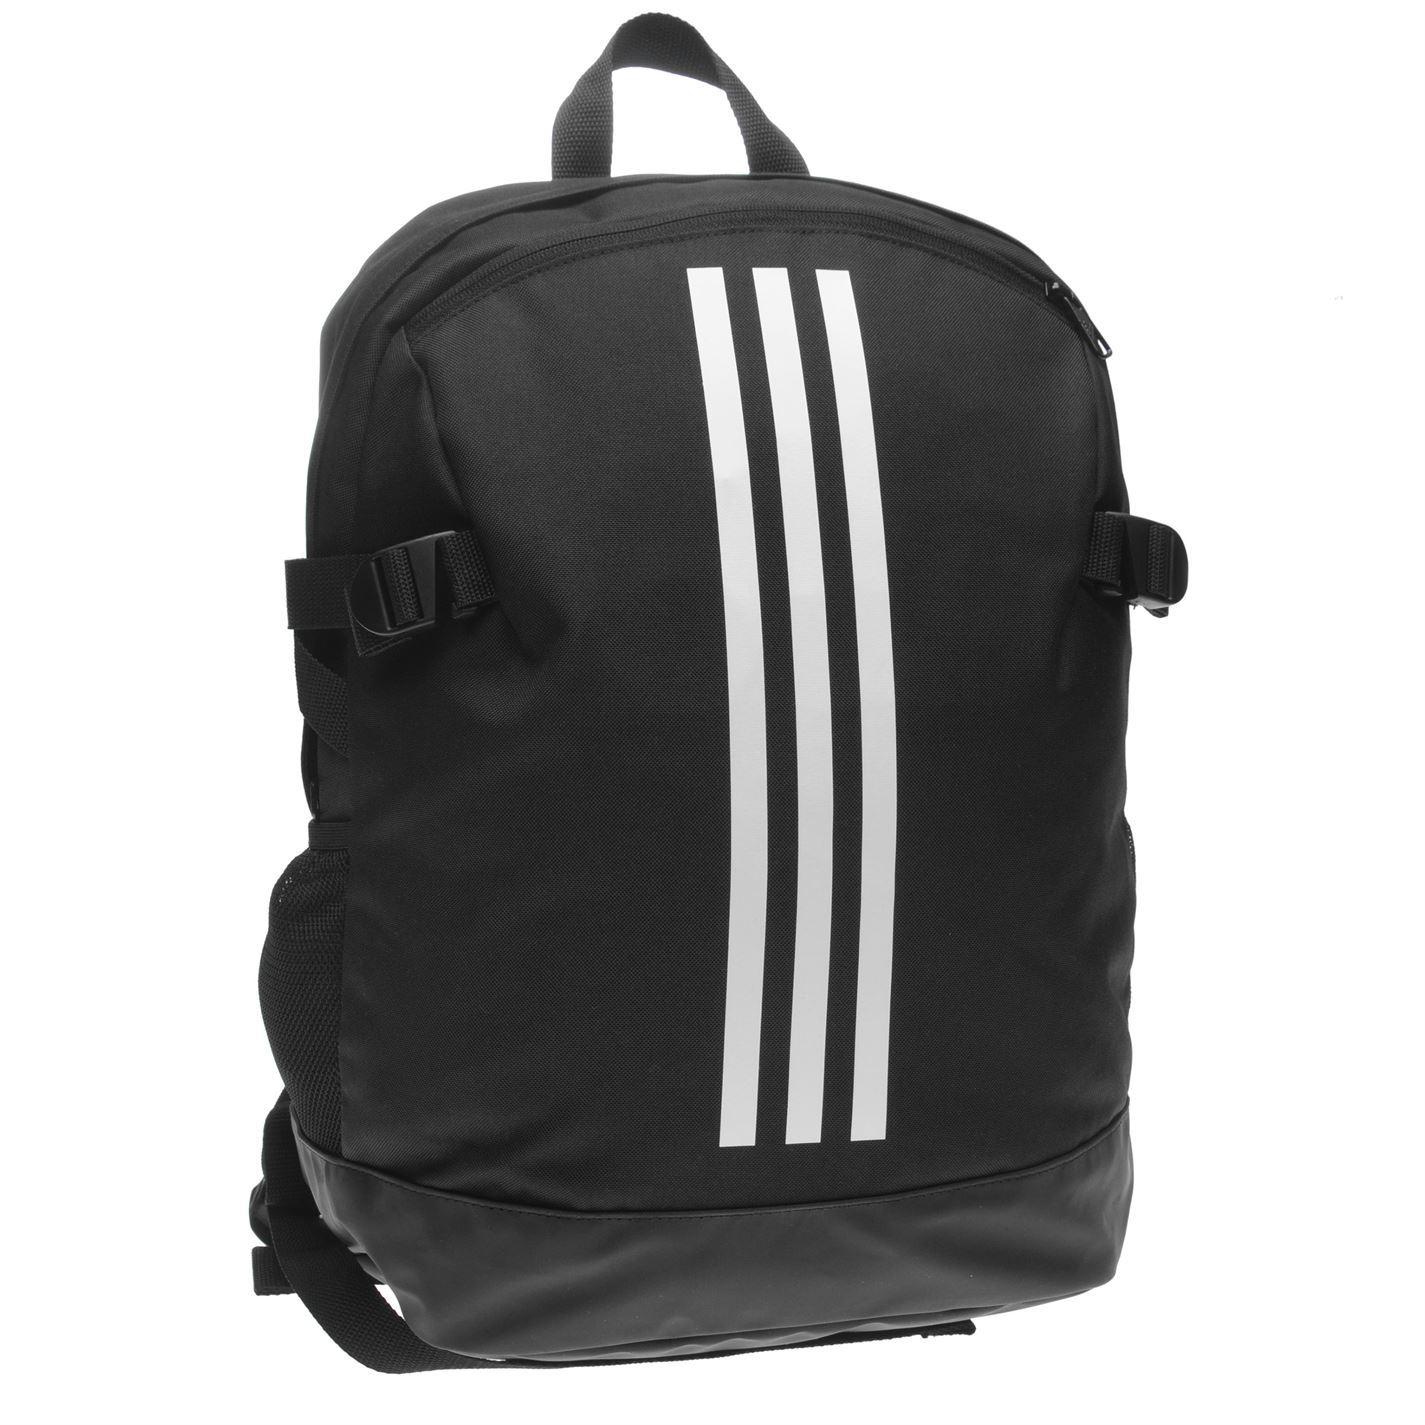 c1f956f8b88 adidas Power 4 Backpack Black White Sports Bag Holdall Rucksack   eBay